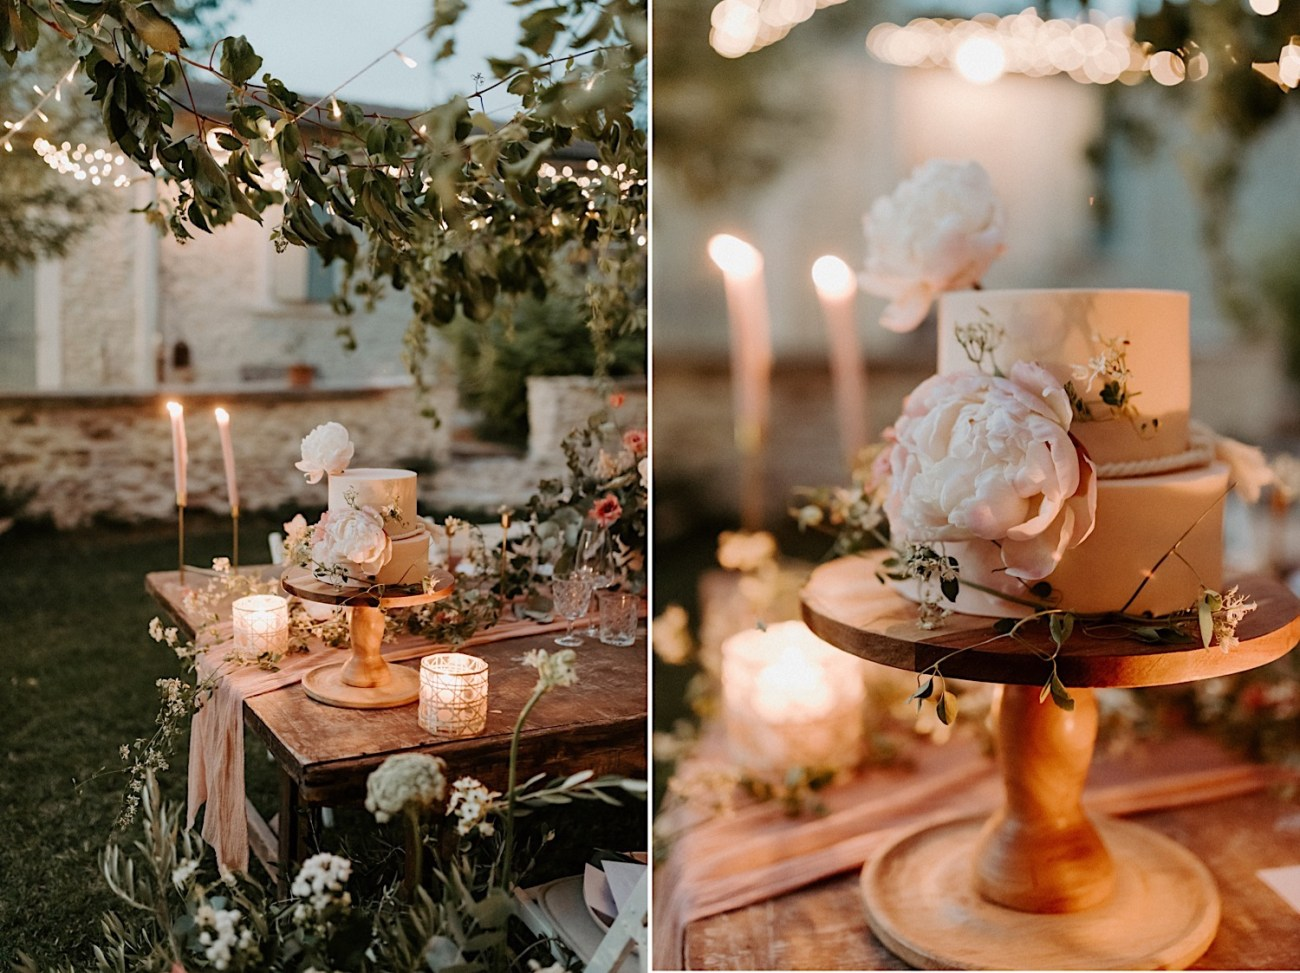 Terre Ugo Un Marriage En Provence Lavender Field Wedding French Wedding Provence Wedding Destination Wedding France Photographe De Marriage Provence France Anais Possamai Photography 49